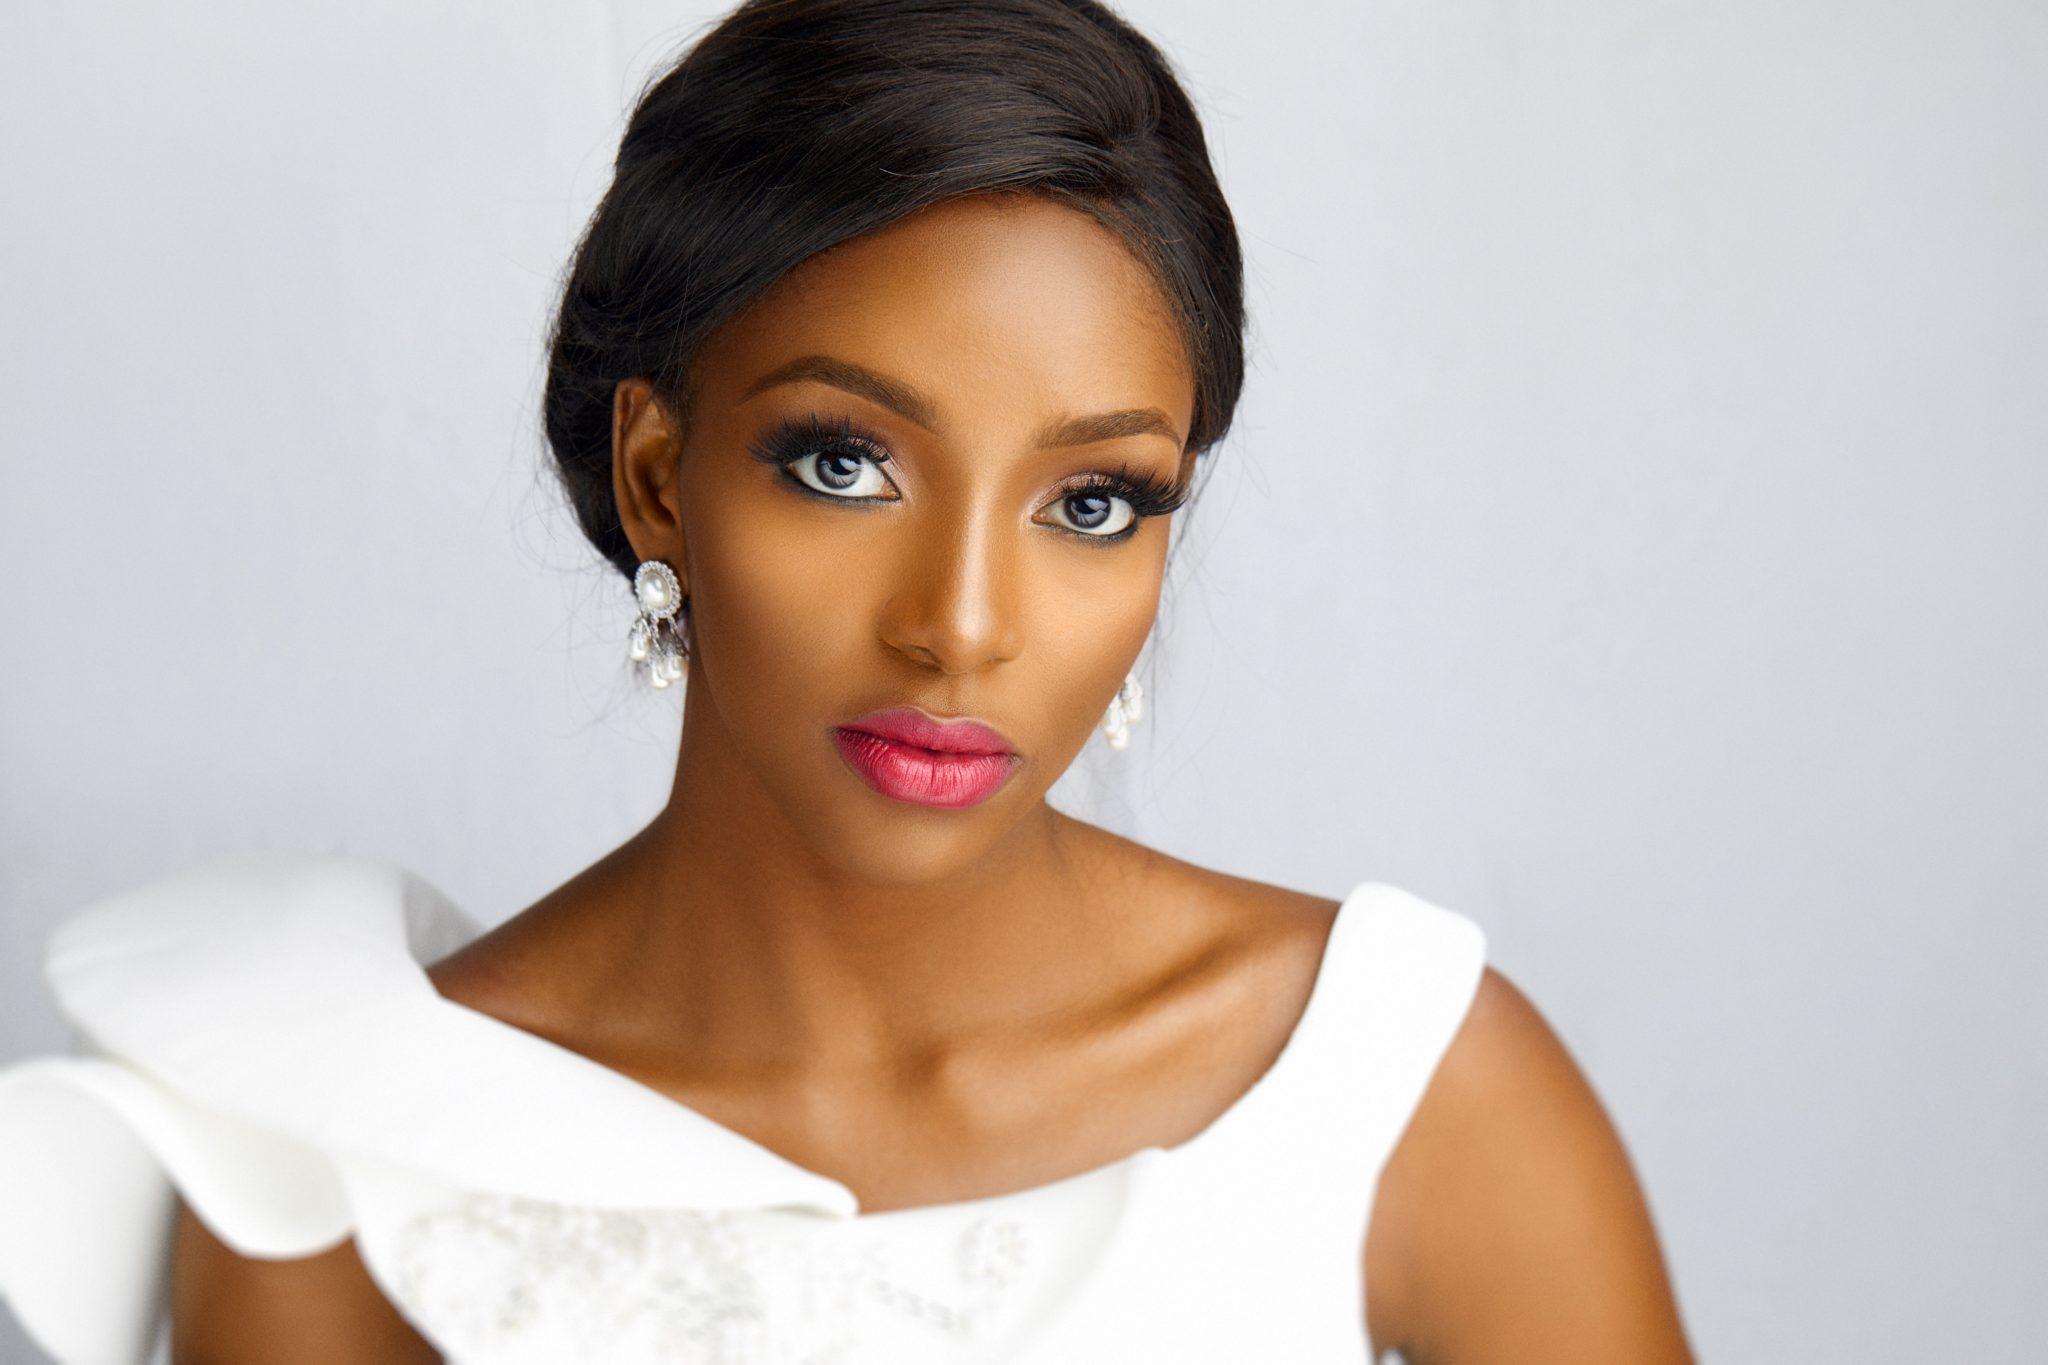 chioma-obiadi-miss-nigeria-2016-releases-elegant-photos-shot-eleanor-goodey